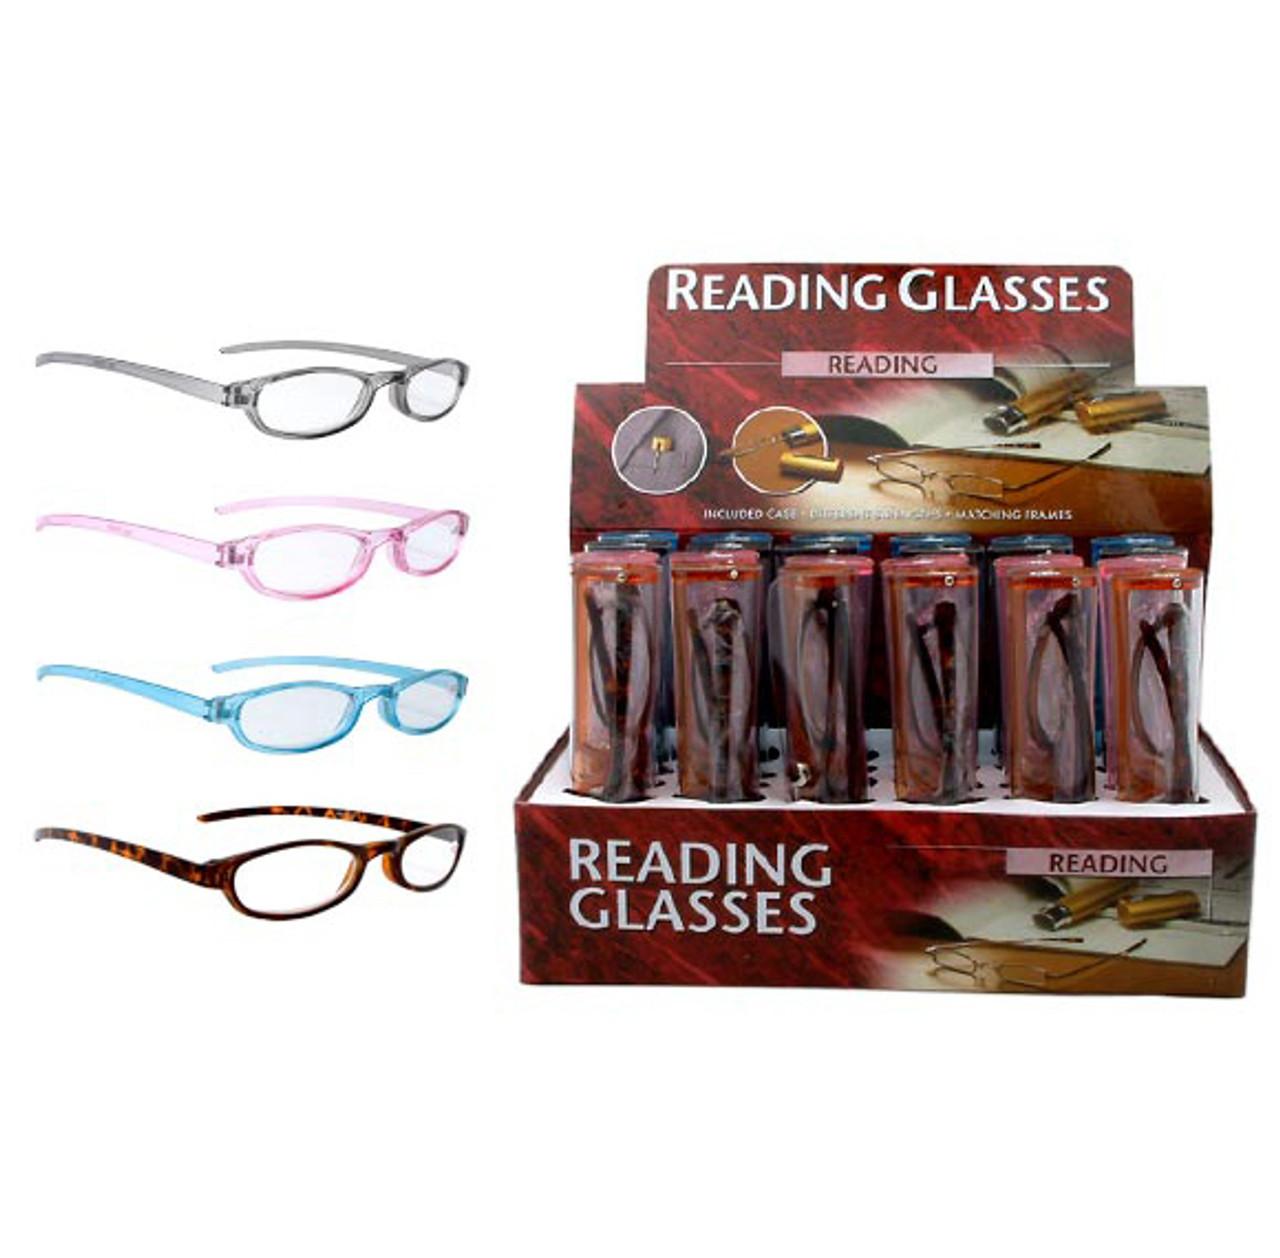 Reading Glasses - R723 ~ Assorted frame colors & lens powers +1.00 – +3.00 W/ Plastic Frames (24 pcs.)